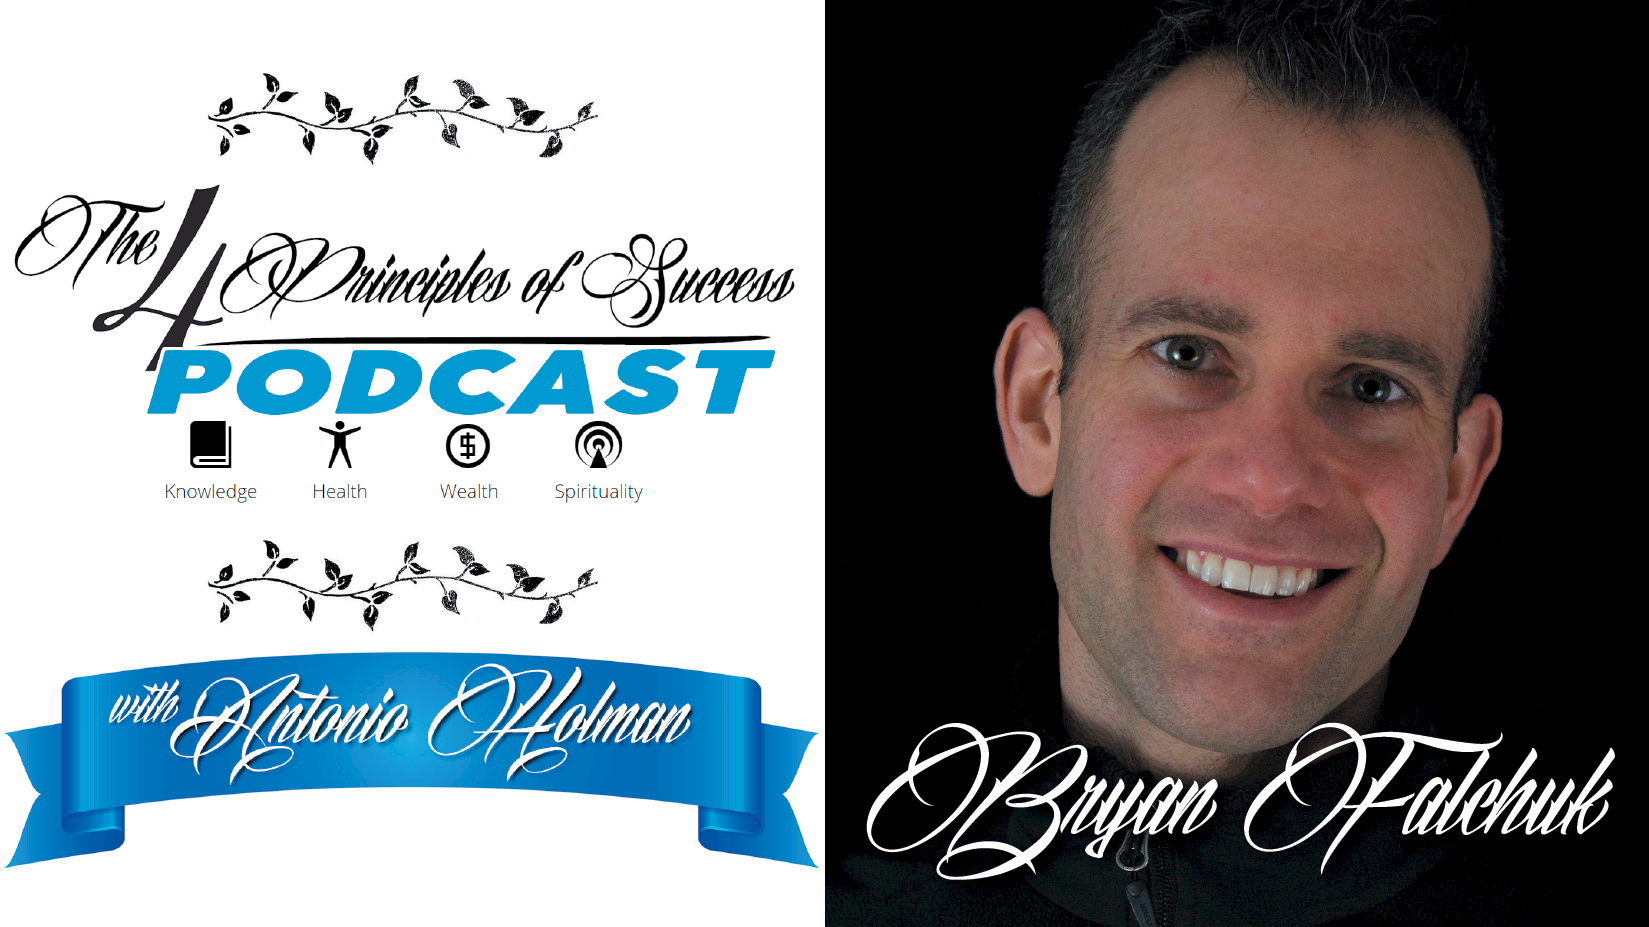 The 4 Principles of Success guest Bryan Falchuk